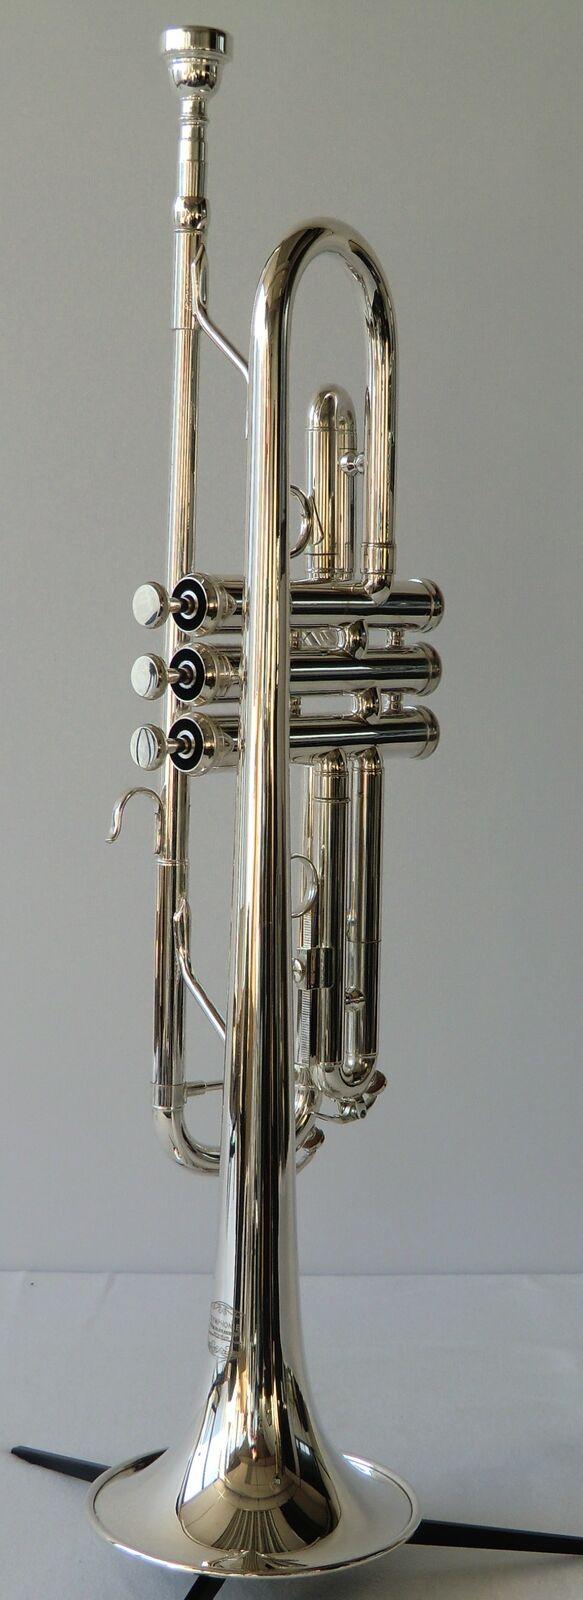 Hochqualitative SYMPHONIE Trompete in B, MONEL Ventile, echt versilbert + Koffer